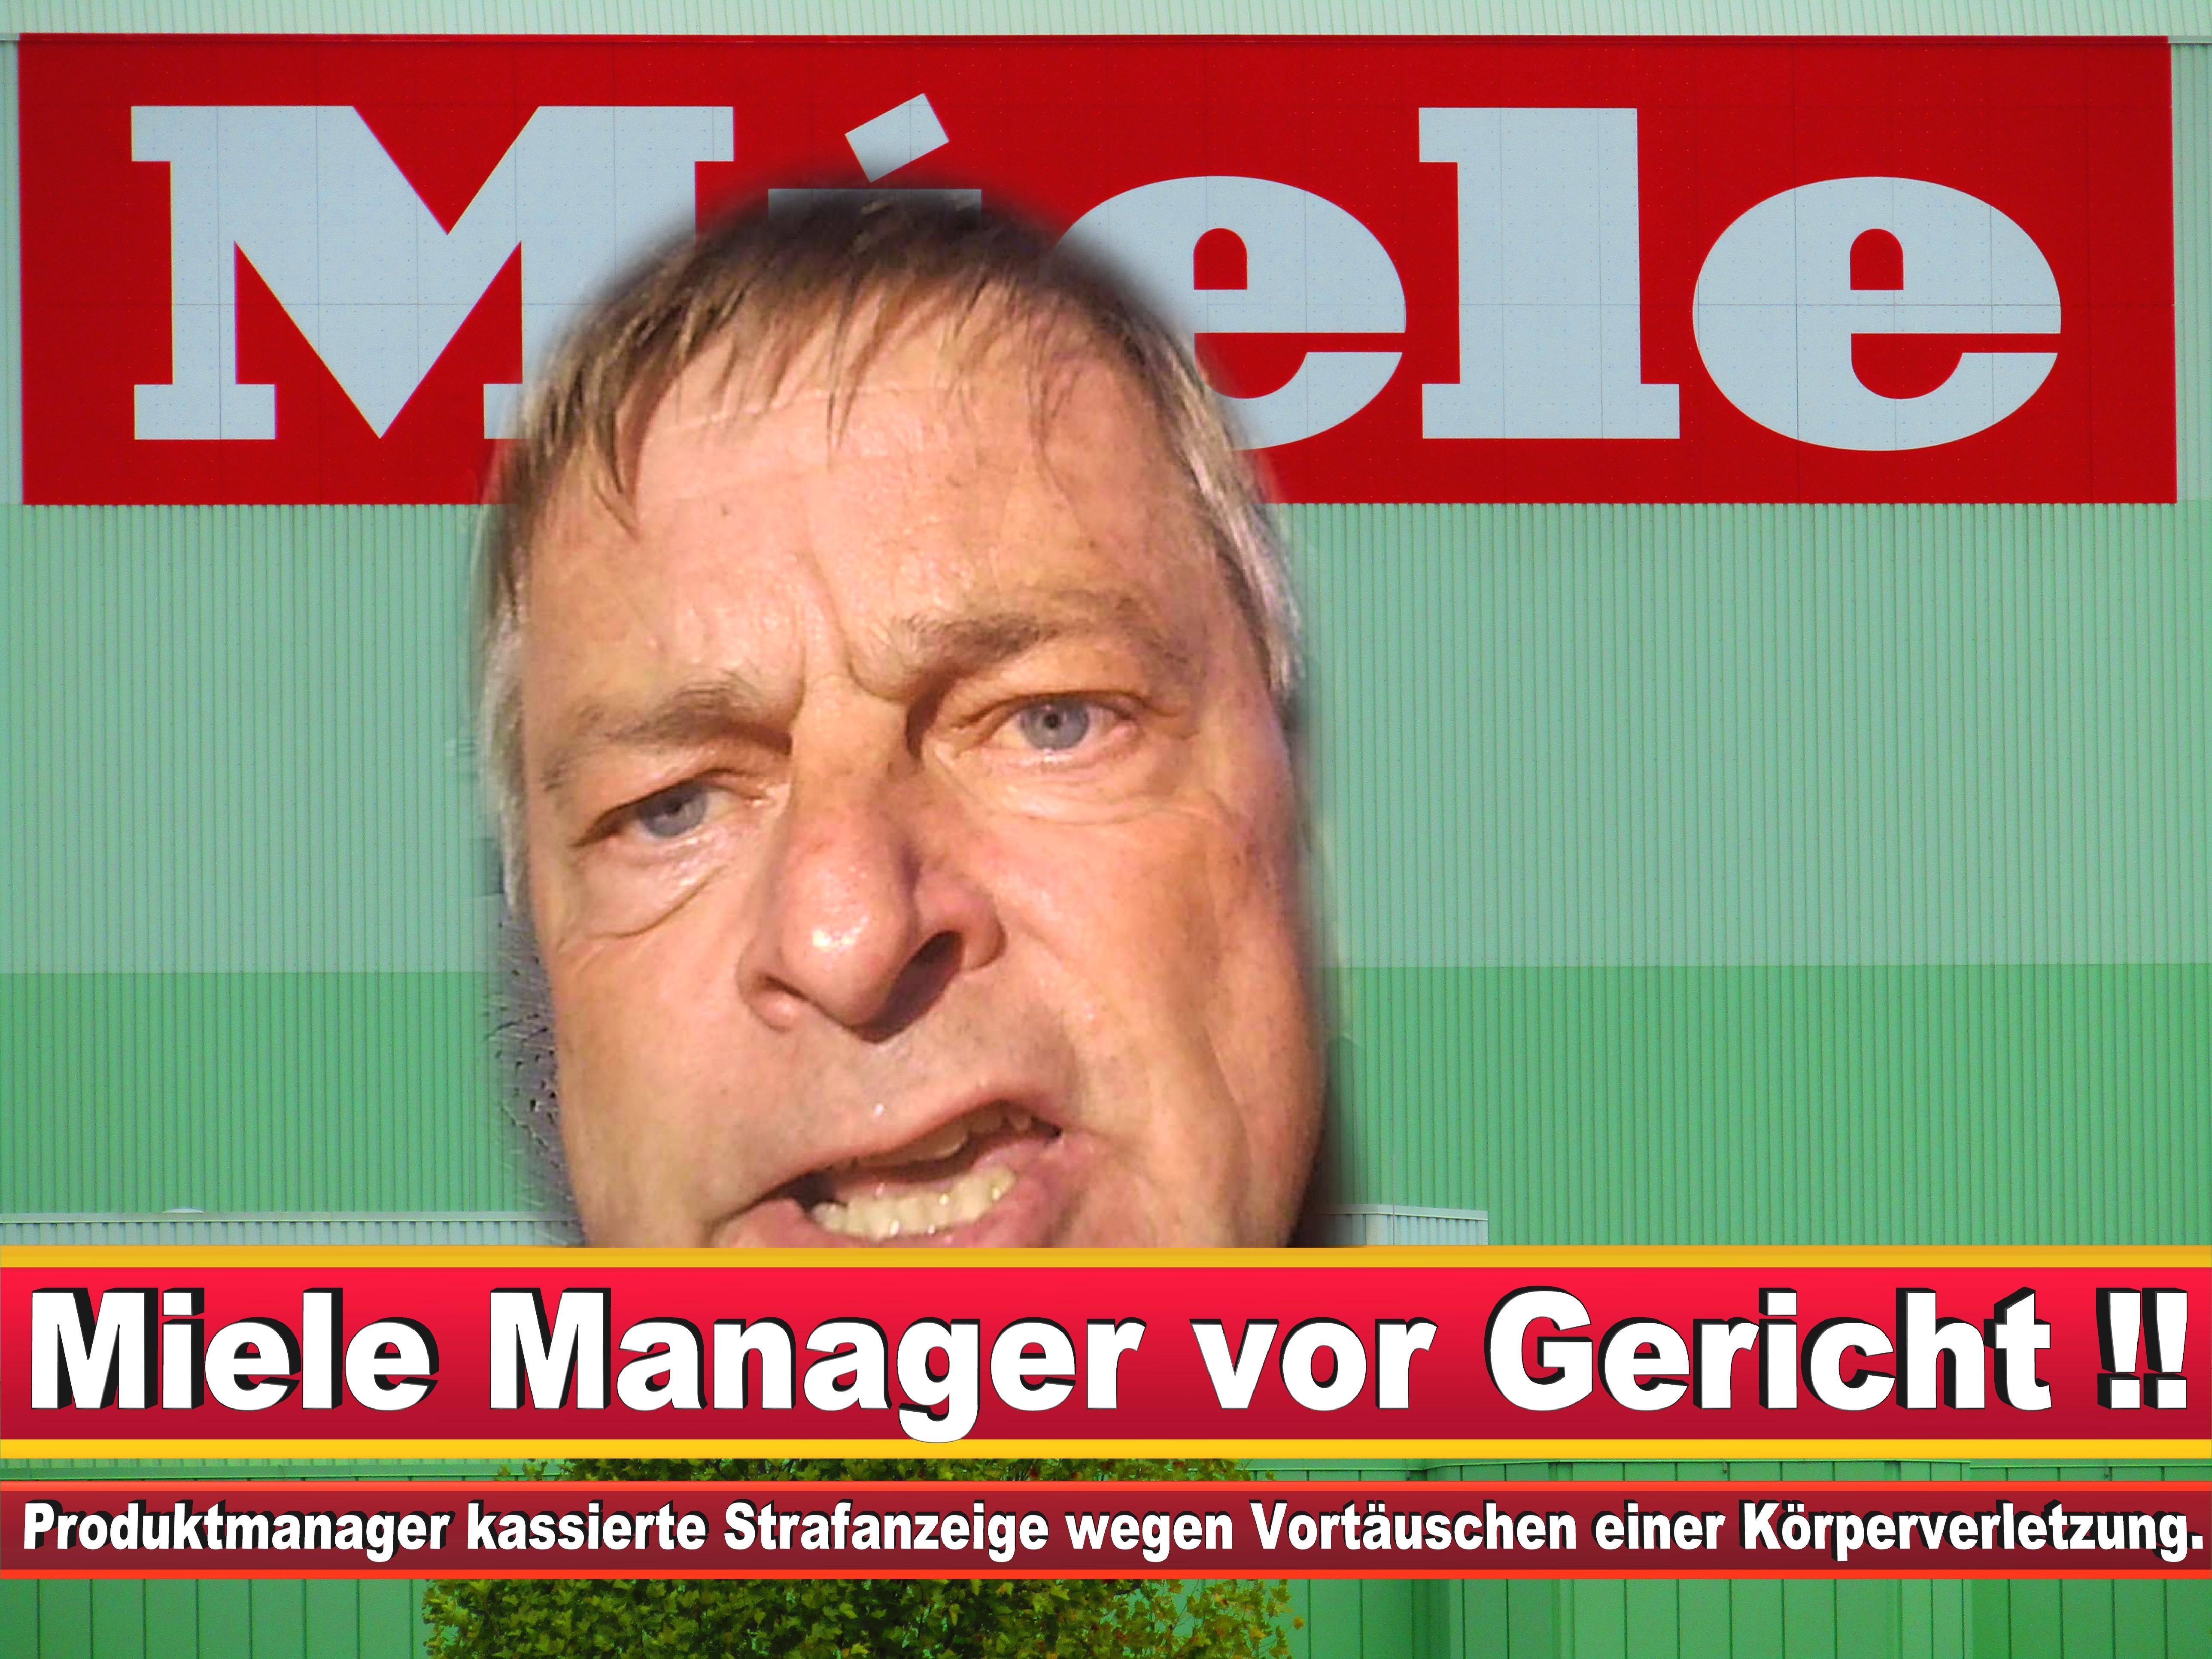 MIELE TROCKNER GÜNSTIG